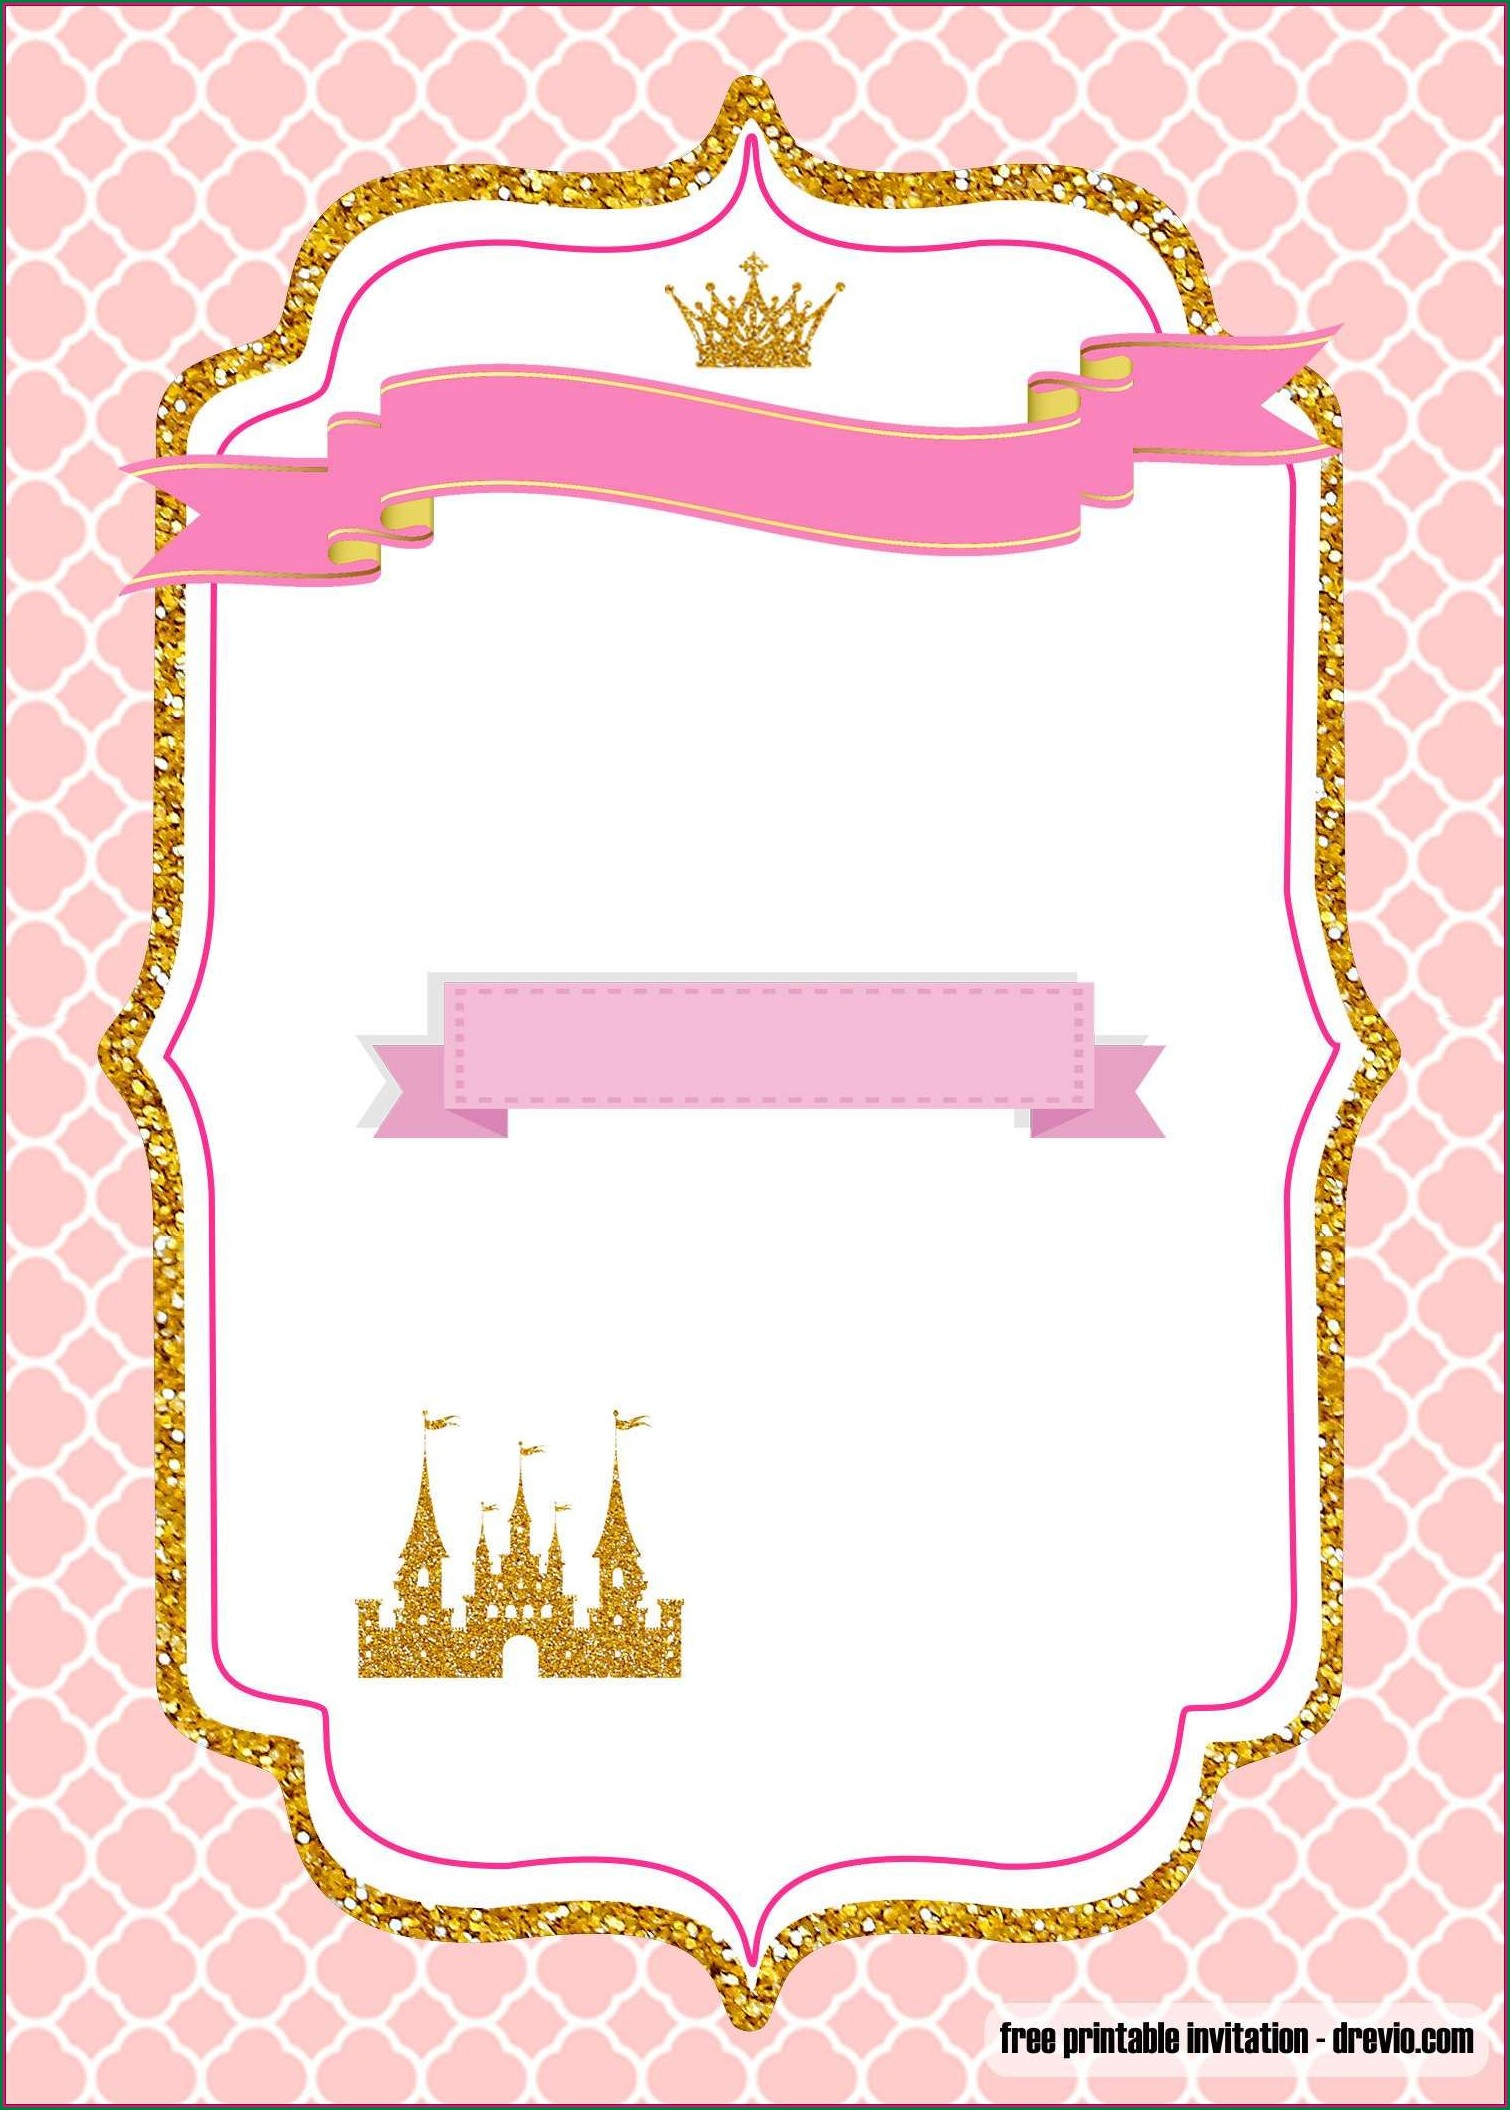 Templates Free Invitation Royal Prince Invitation Background